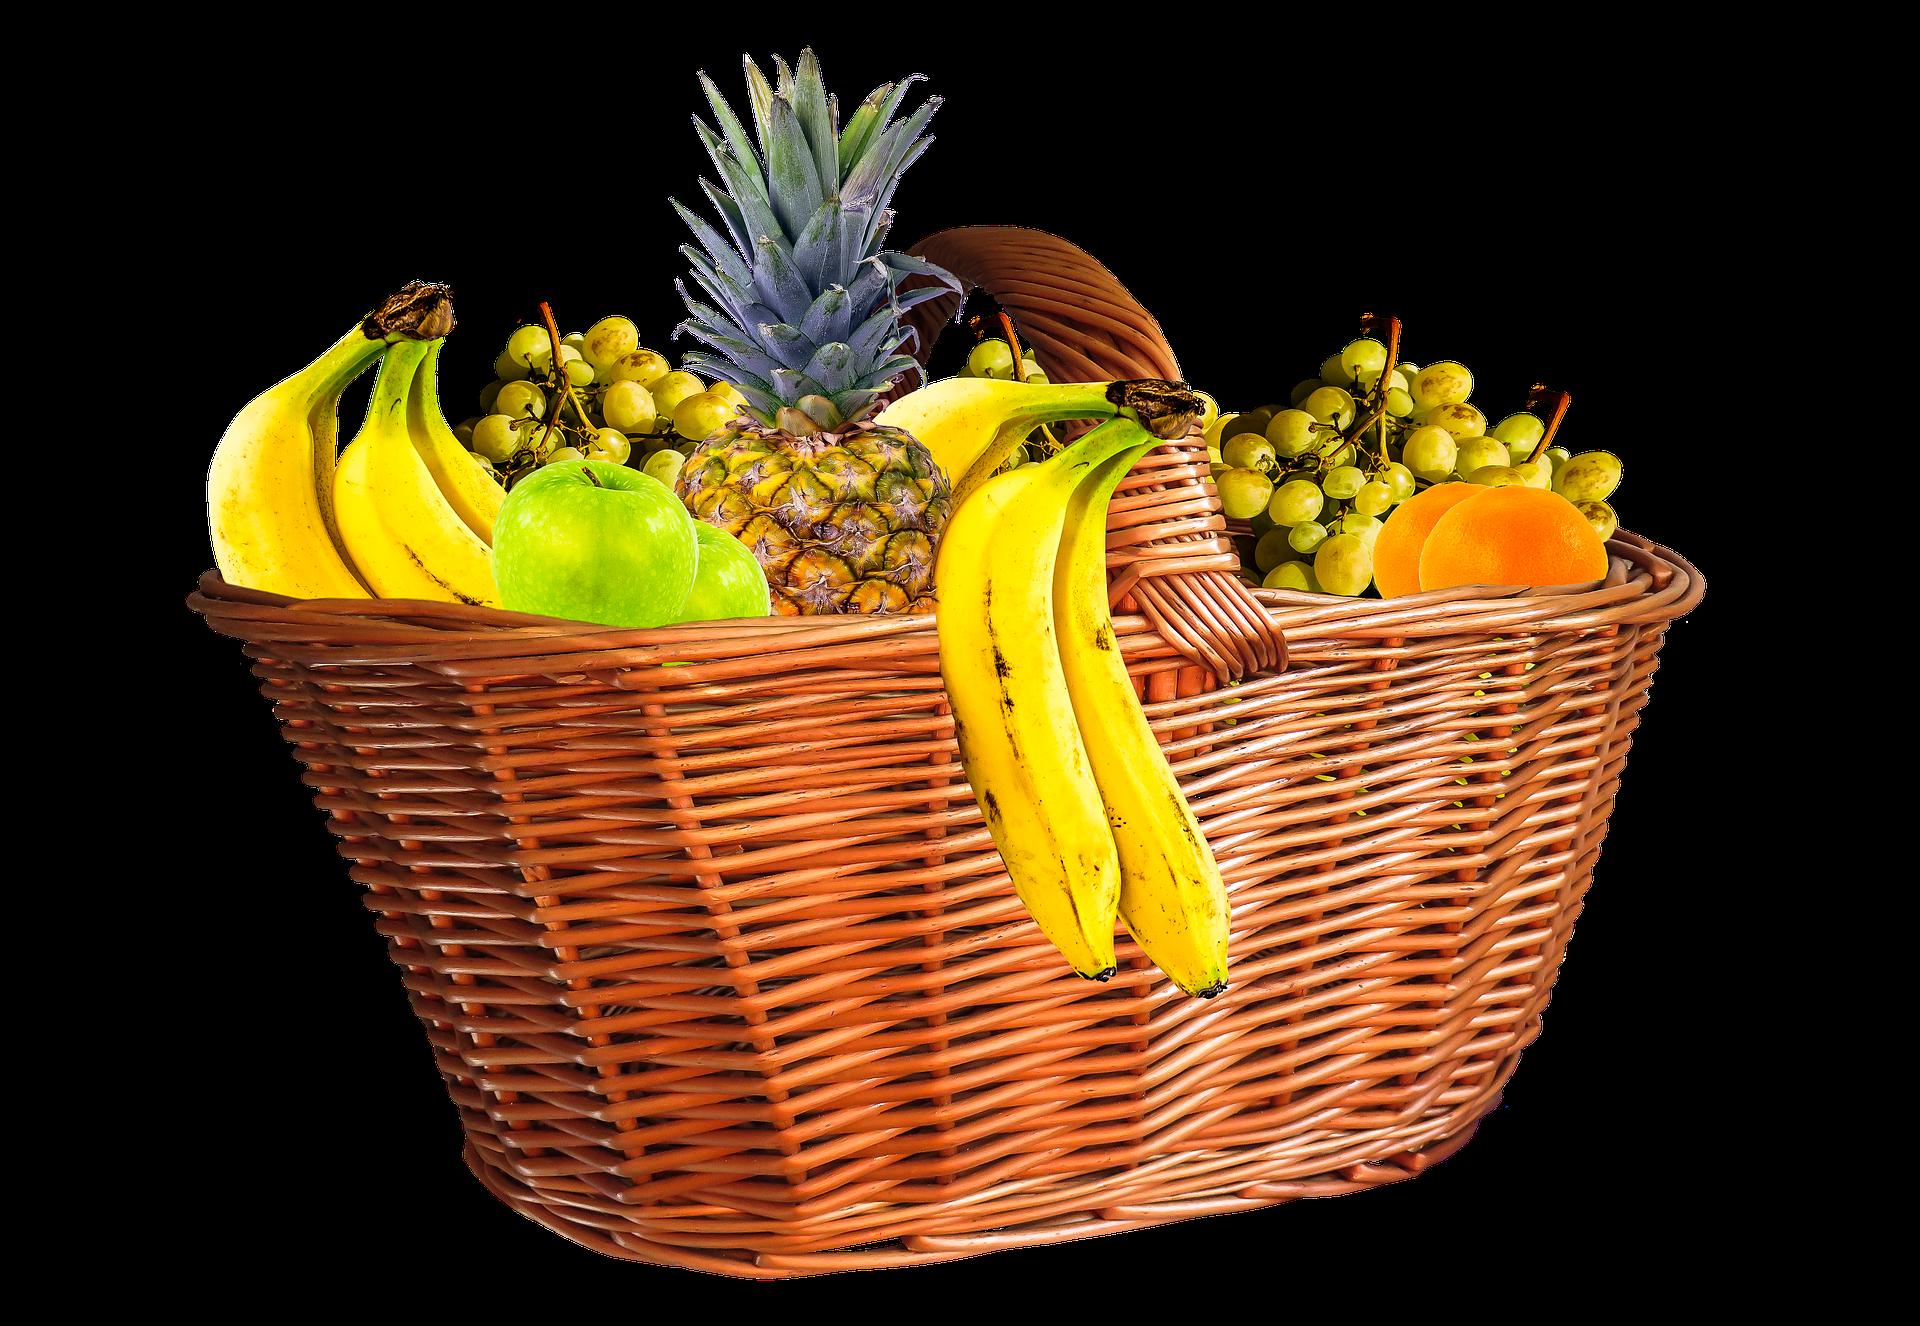 Fruit Basket, Banana, Basket, Food, Fruit, HQ Photo